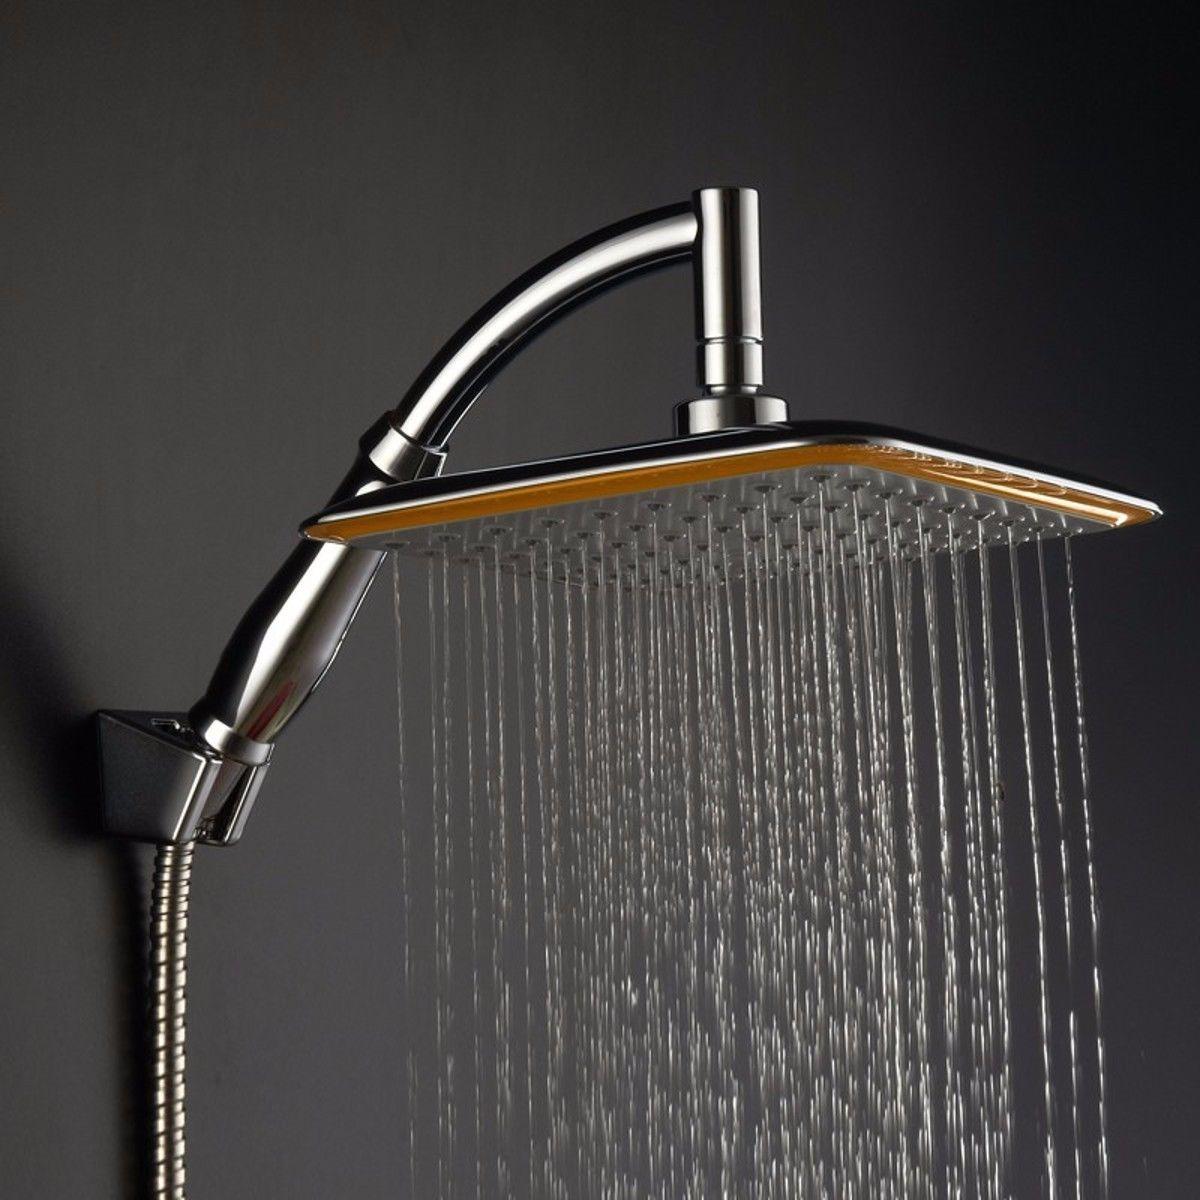 9 Square Stainless Steel Rain Shower Head Rainfall Bathroom Top